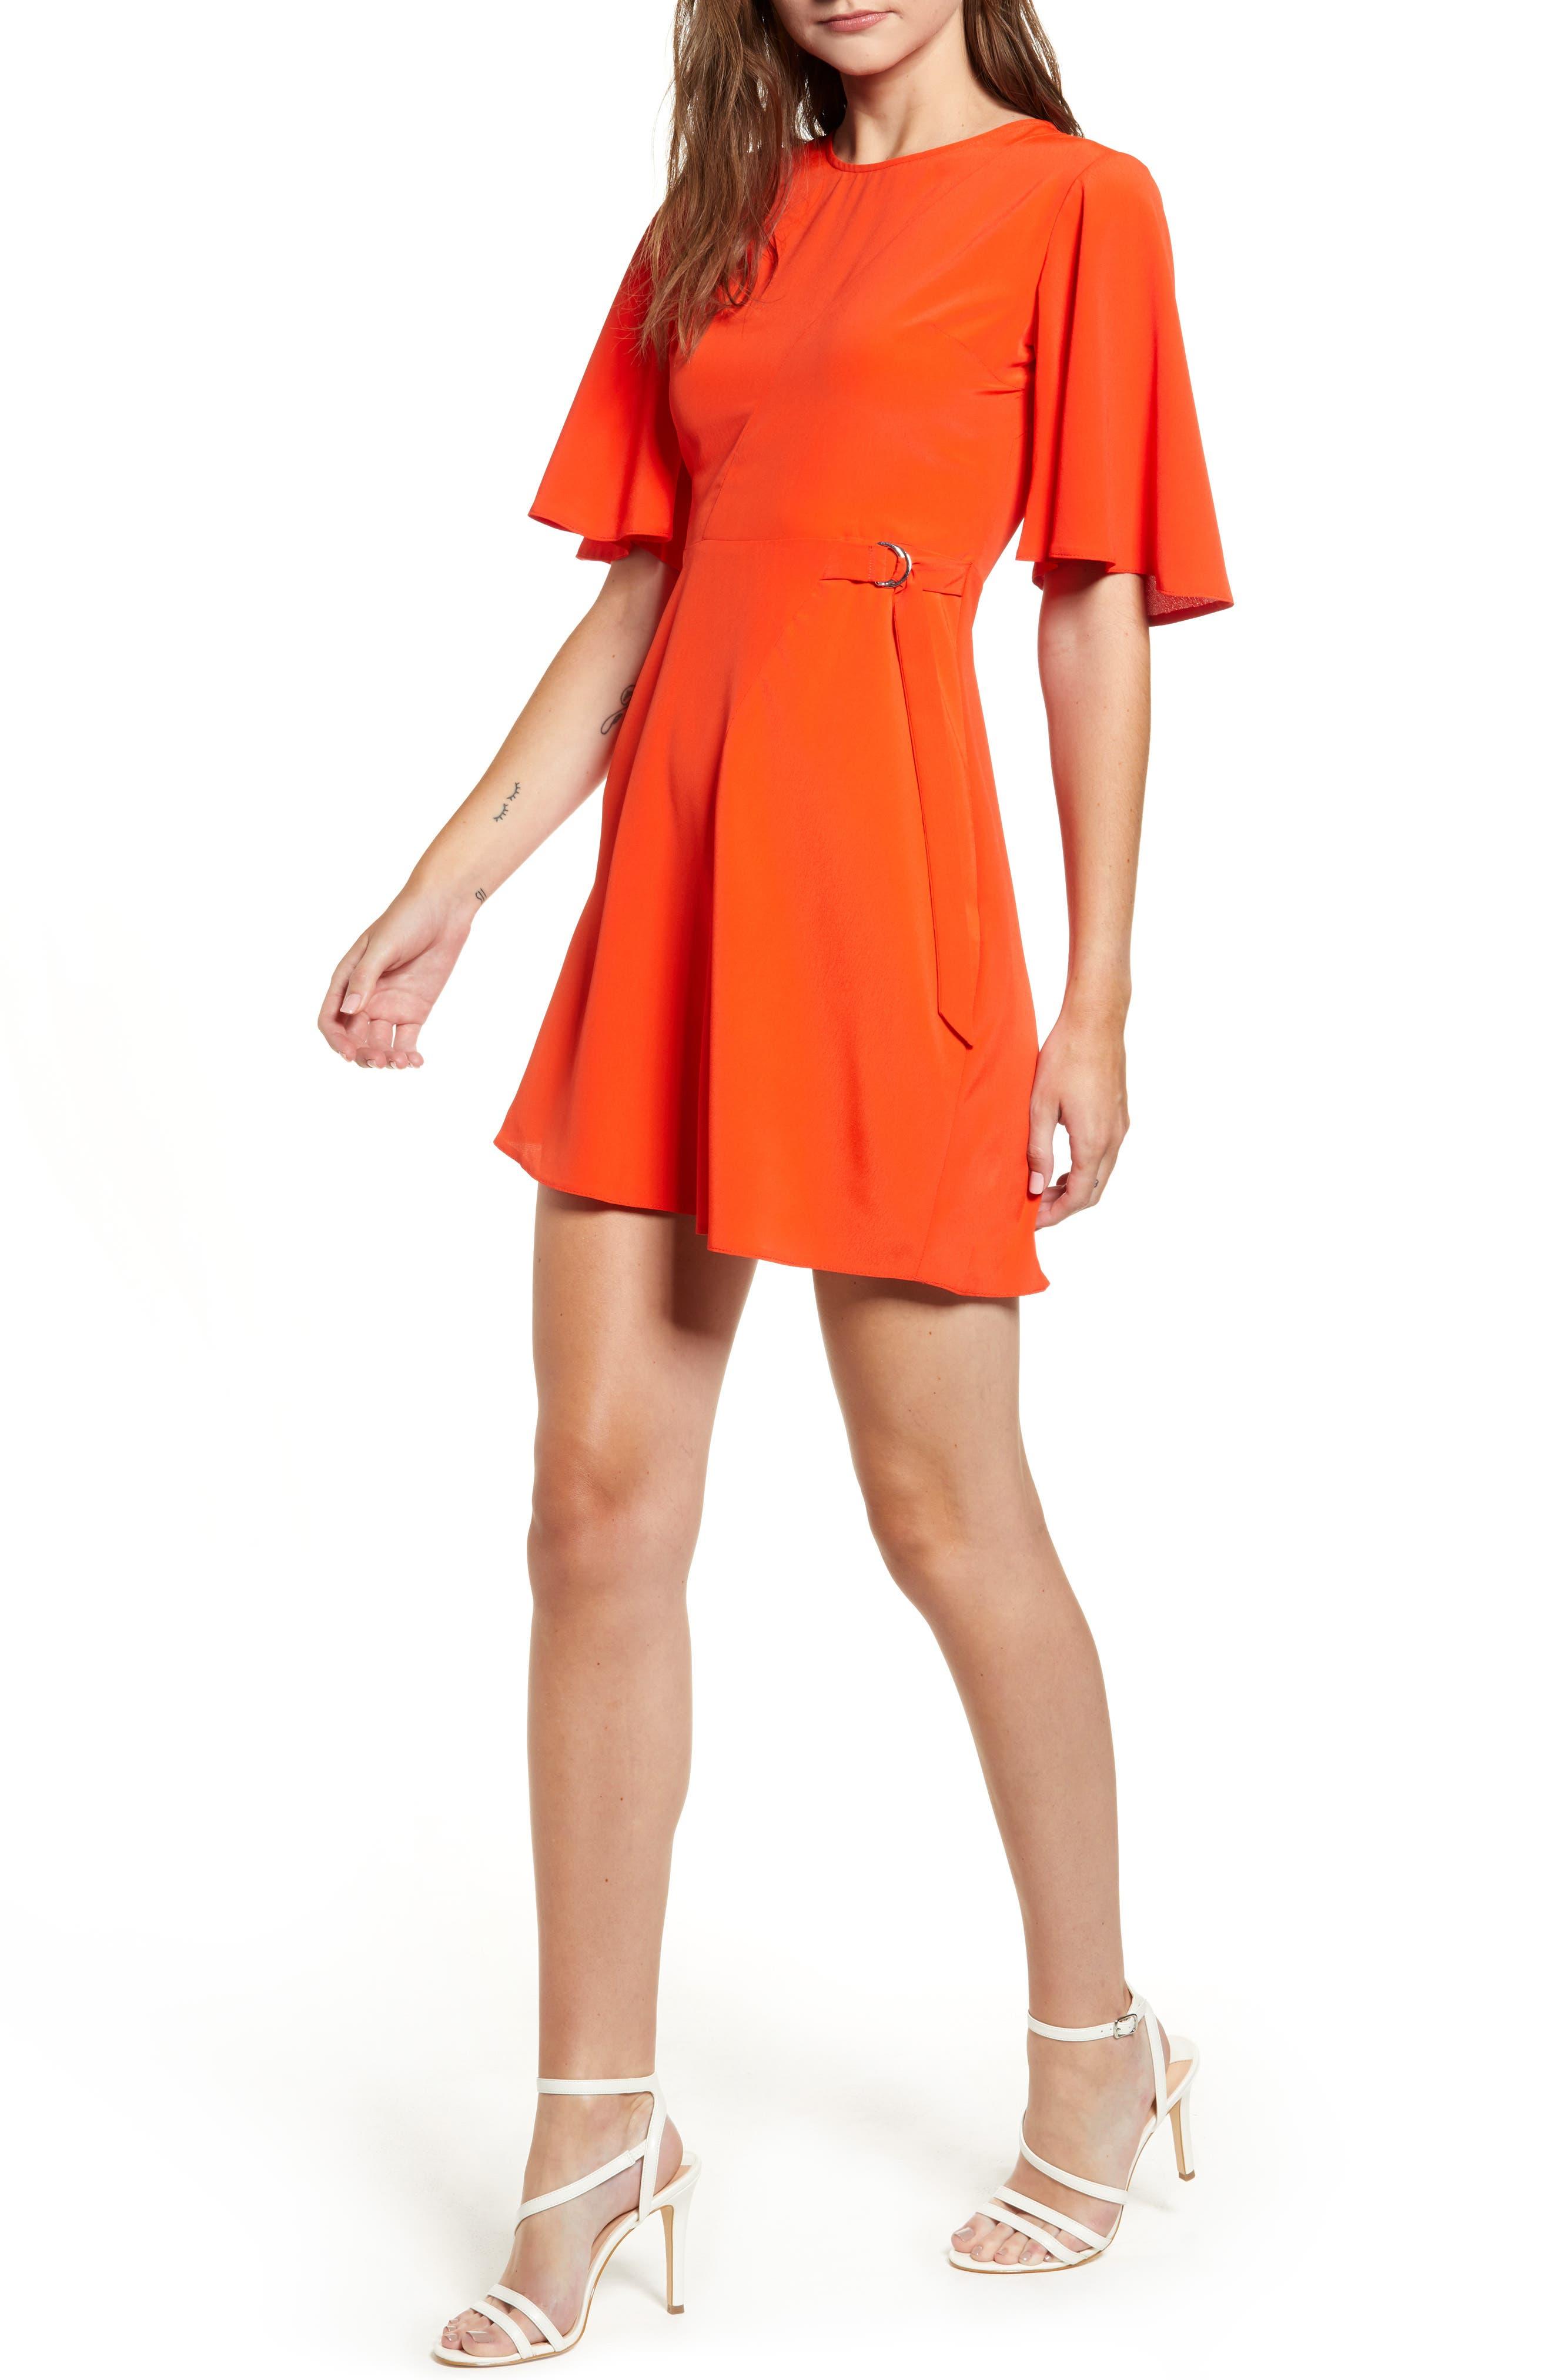 Cutabout Minidress,                         Main,                         color, ORANGE